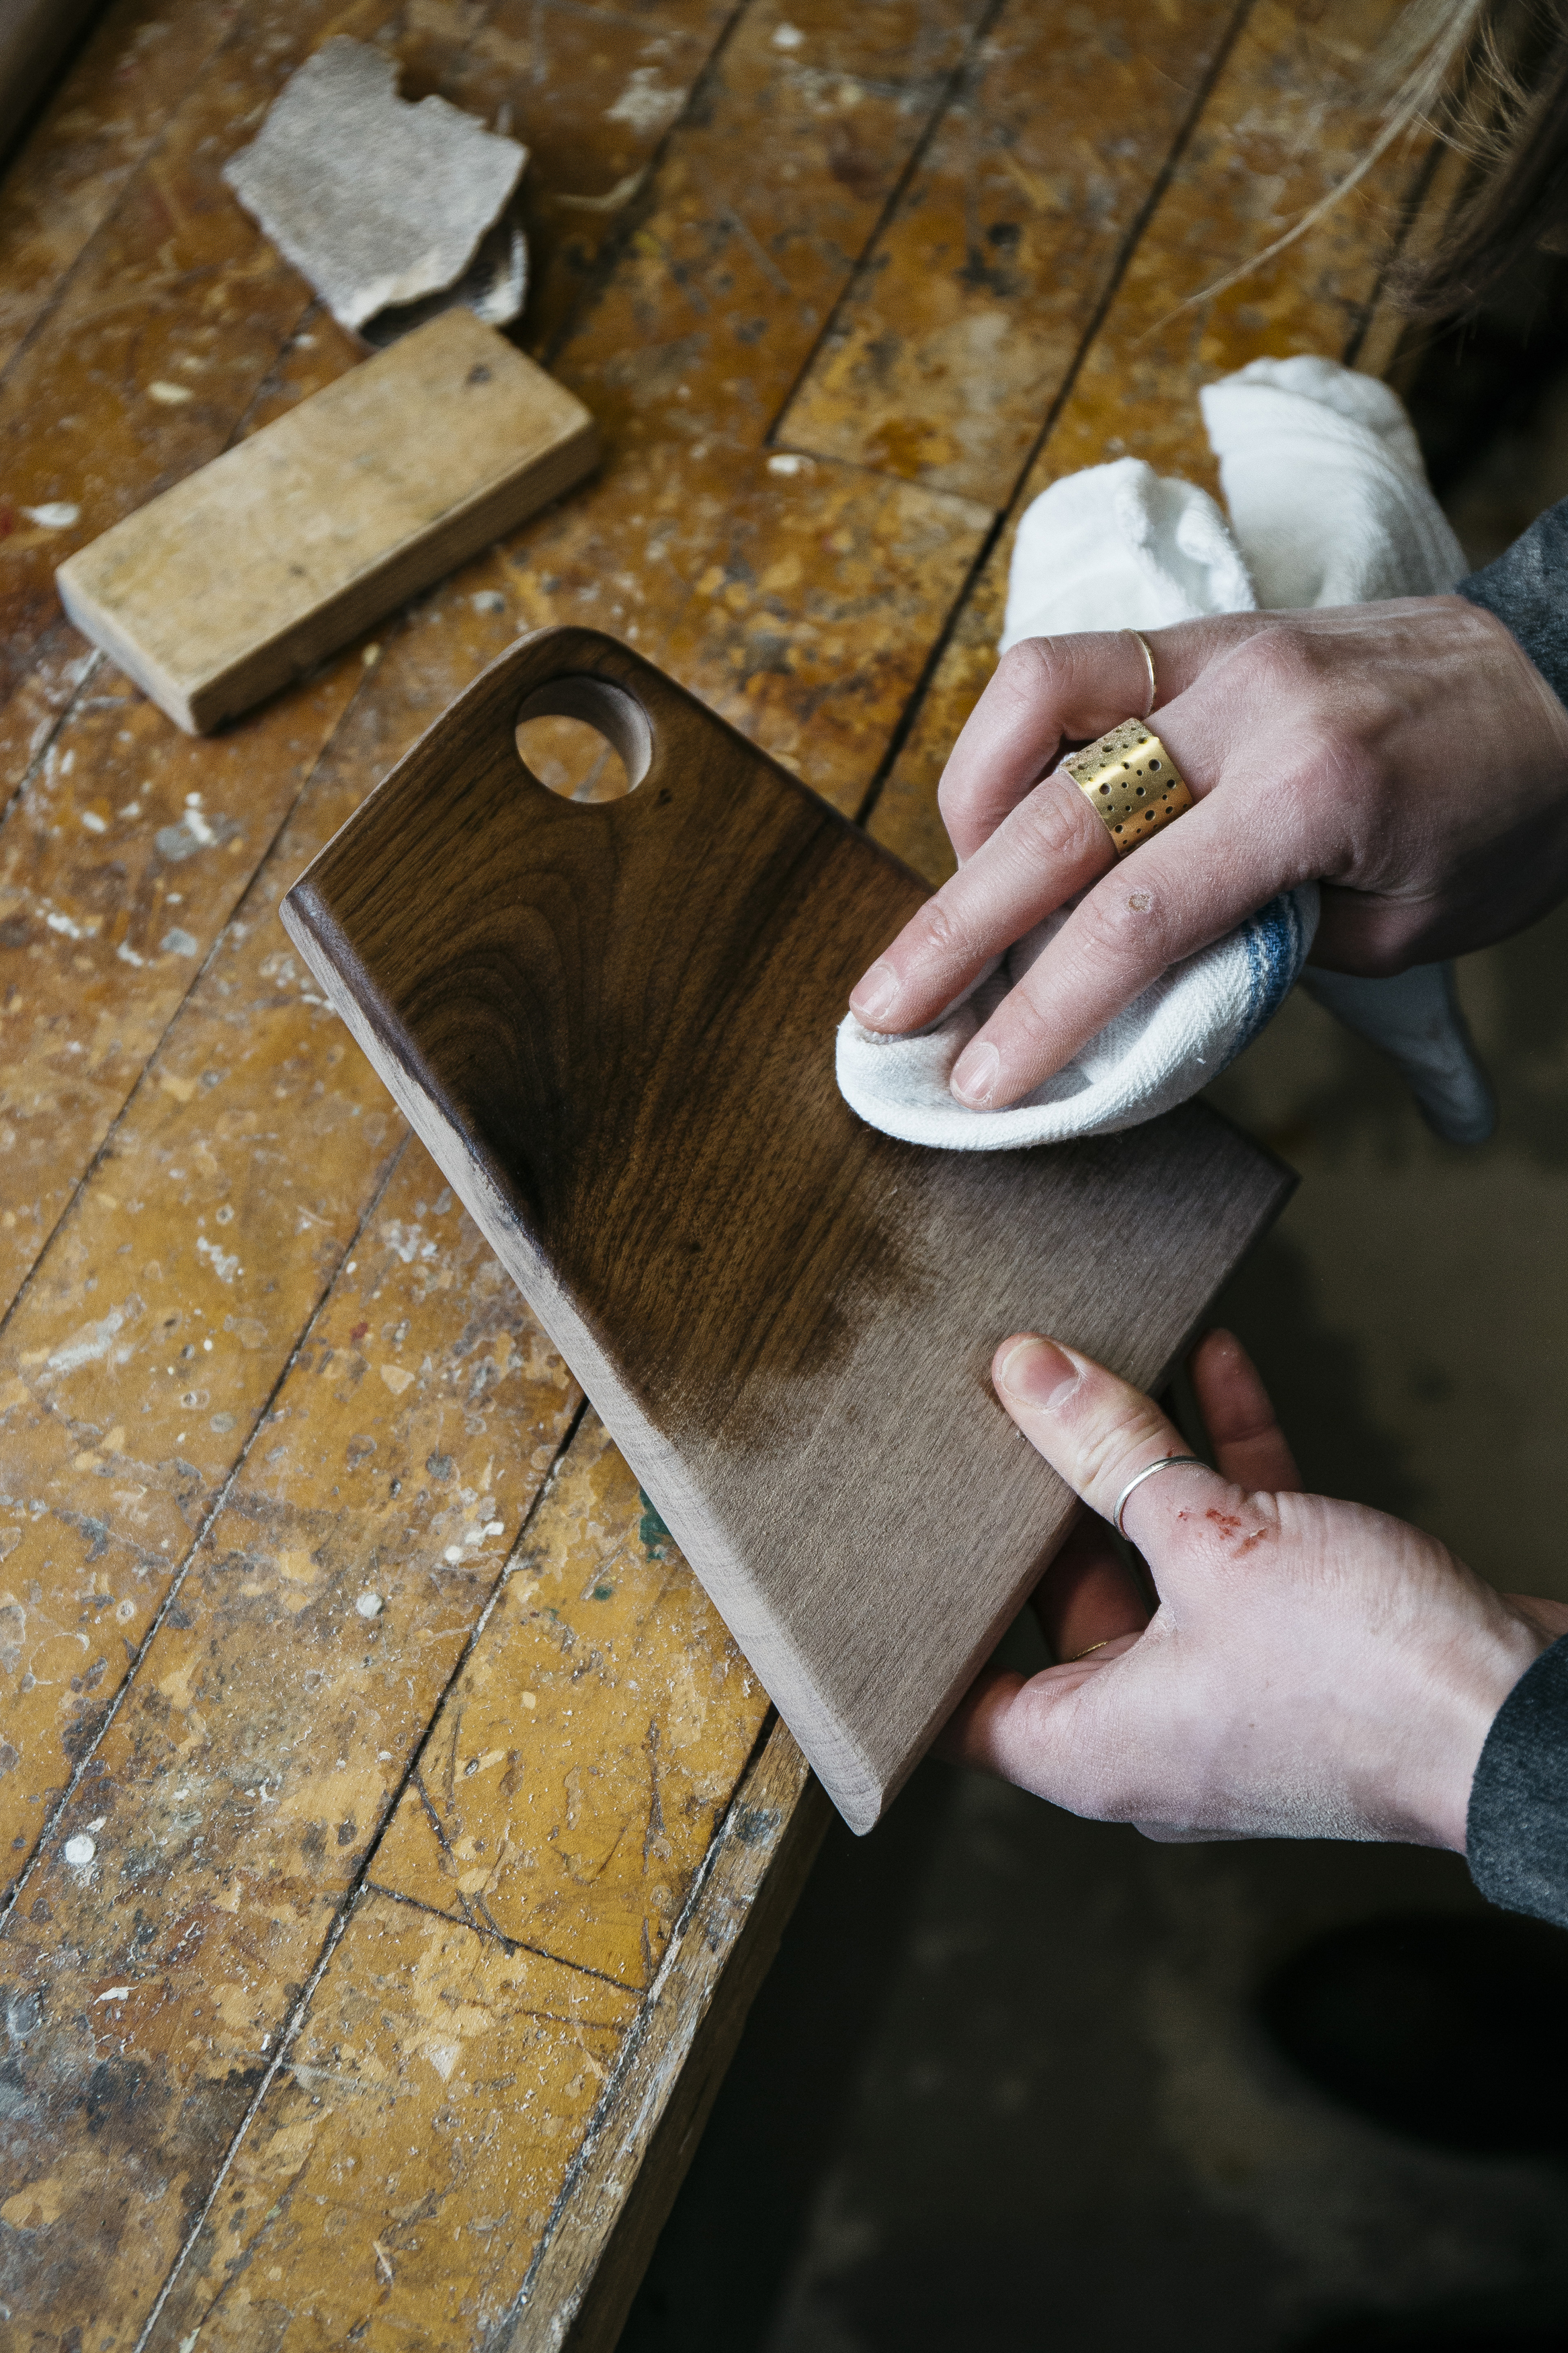 amie artist feature monika pfistner woodworker.jpg